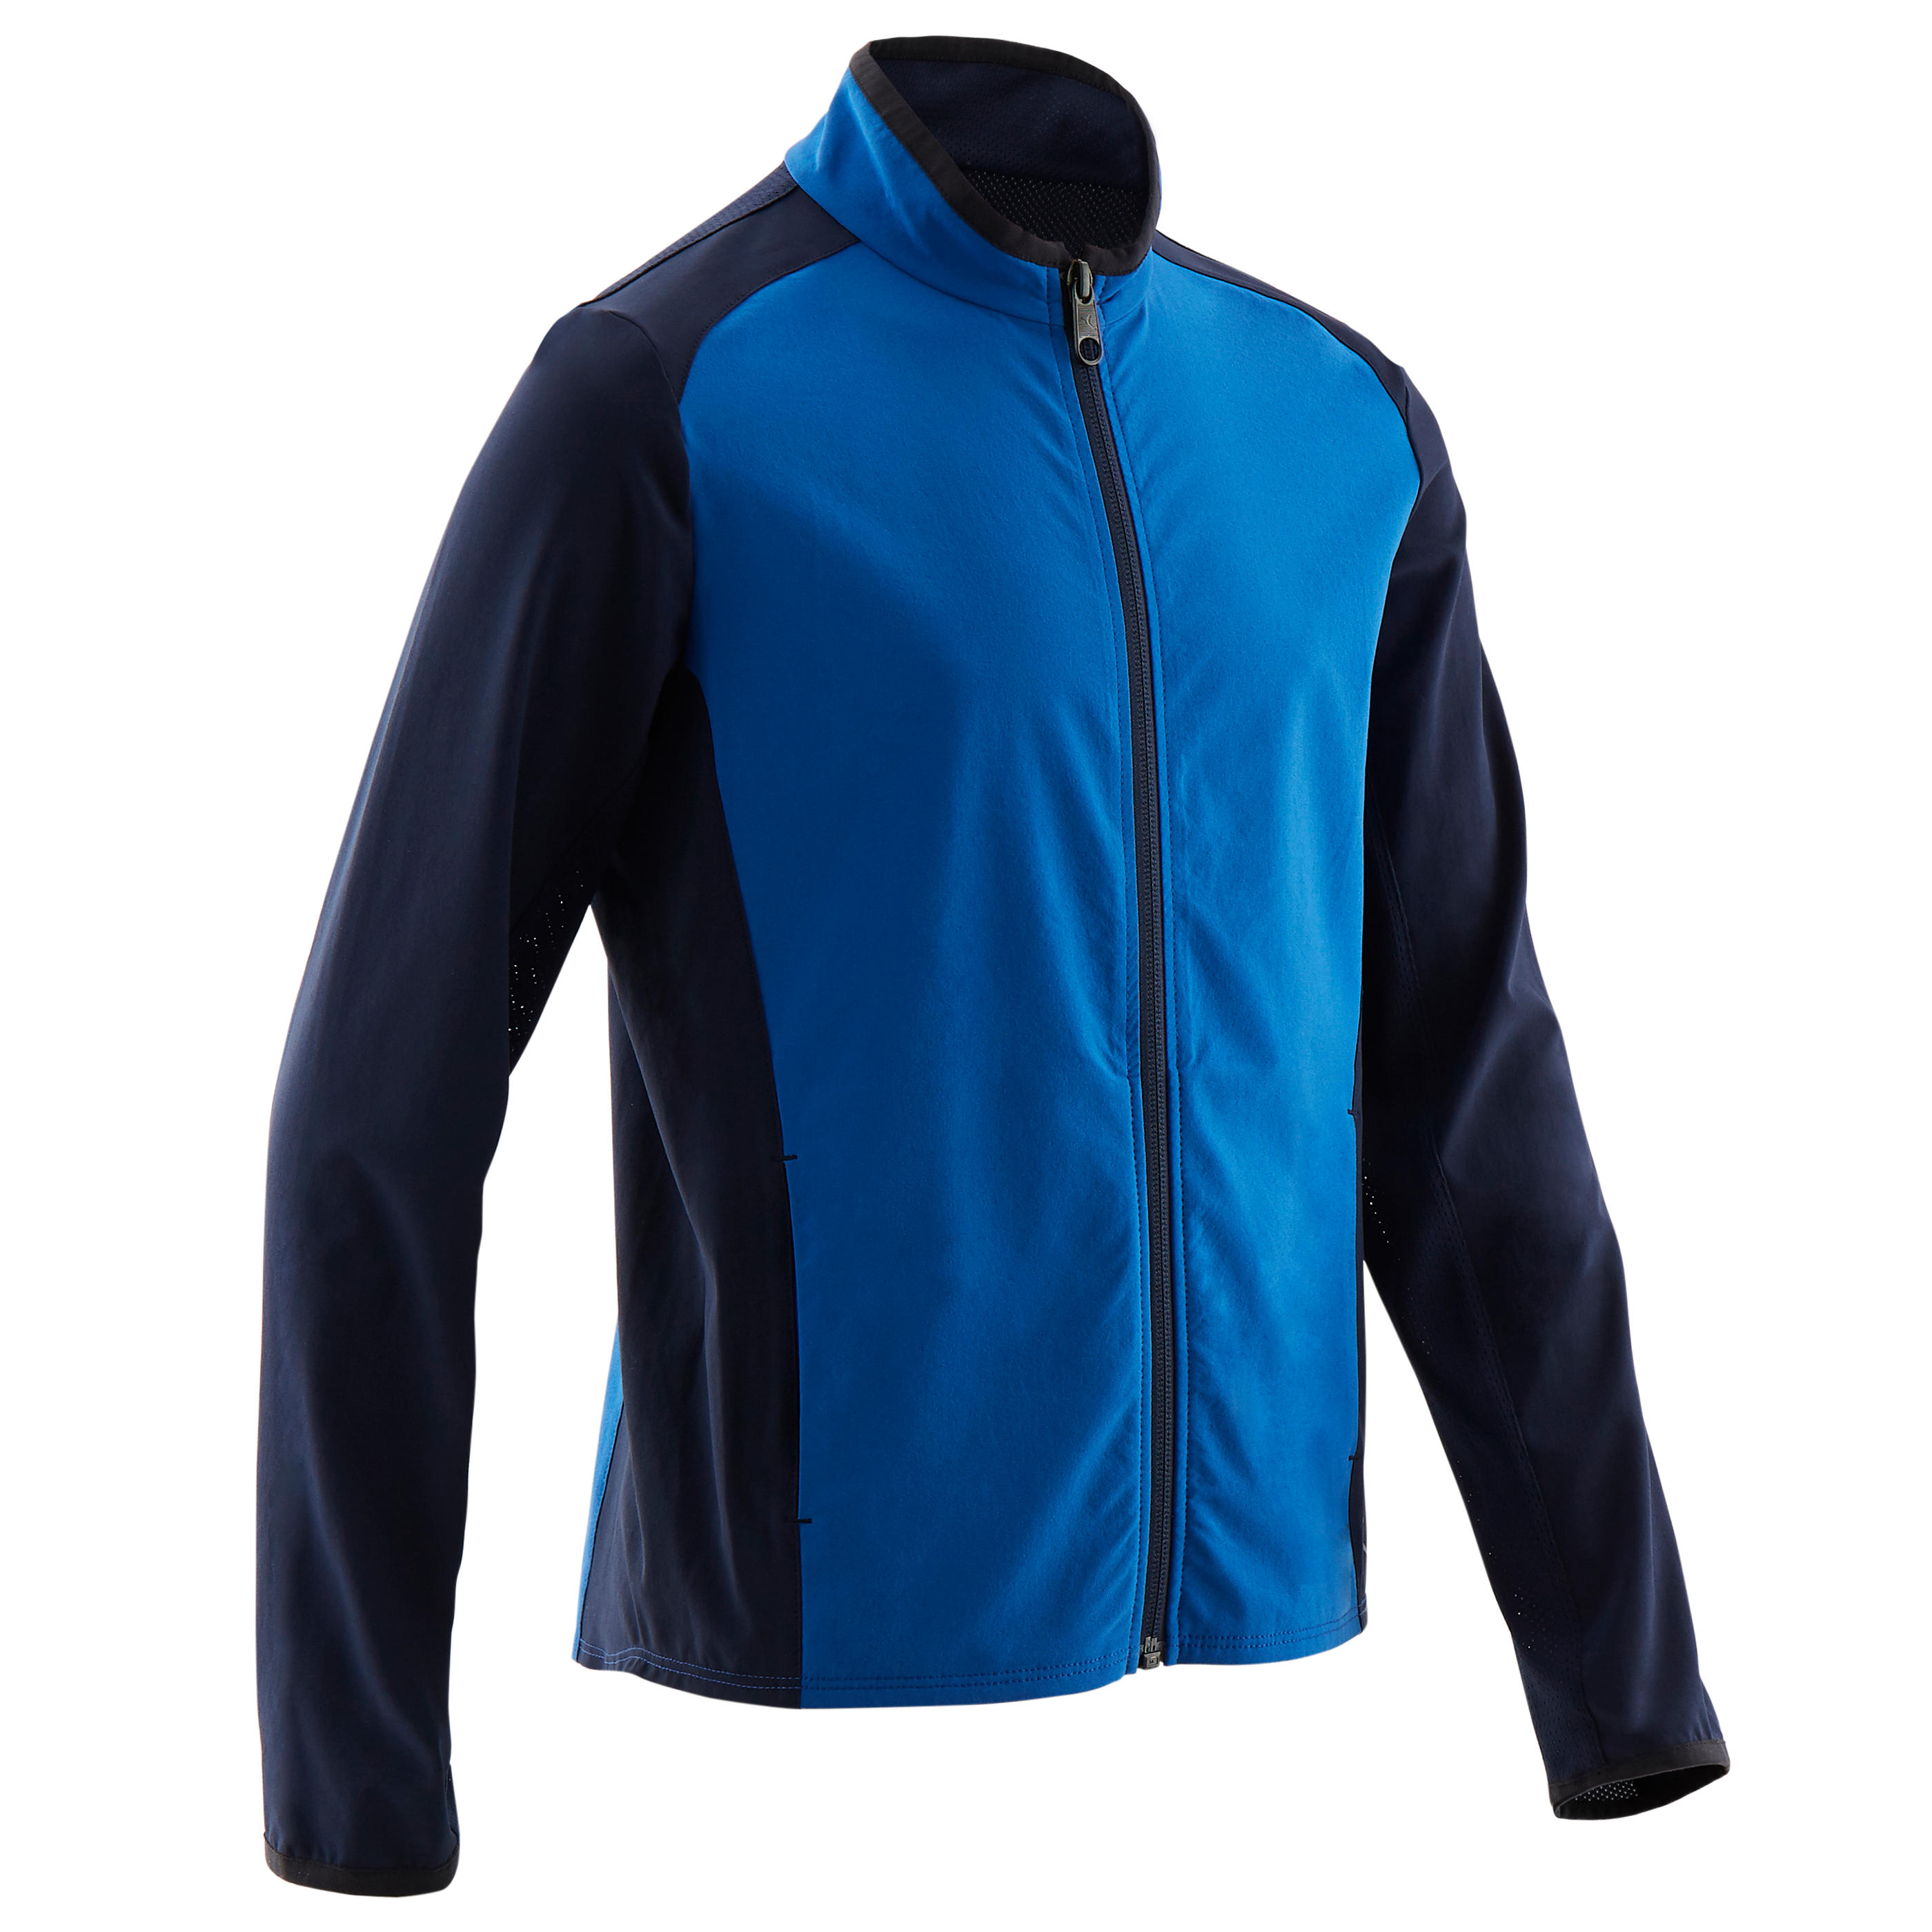 Jachetă W500 băieți la Reducere poza